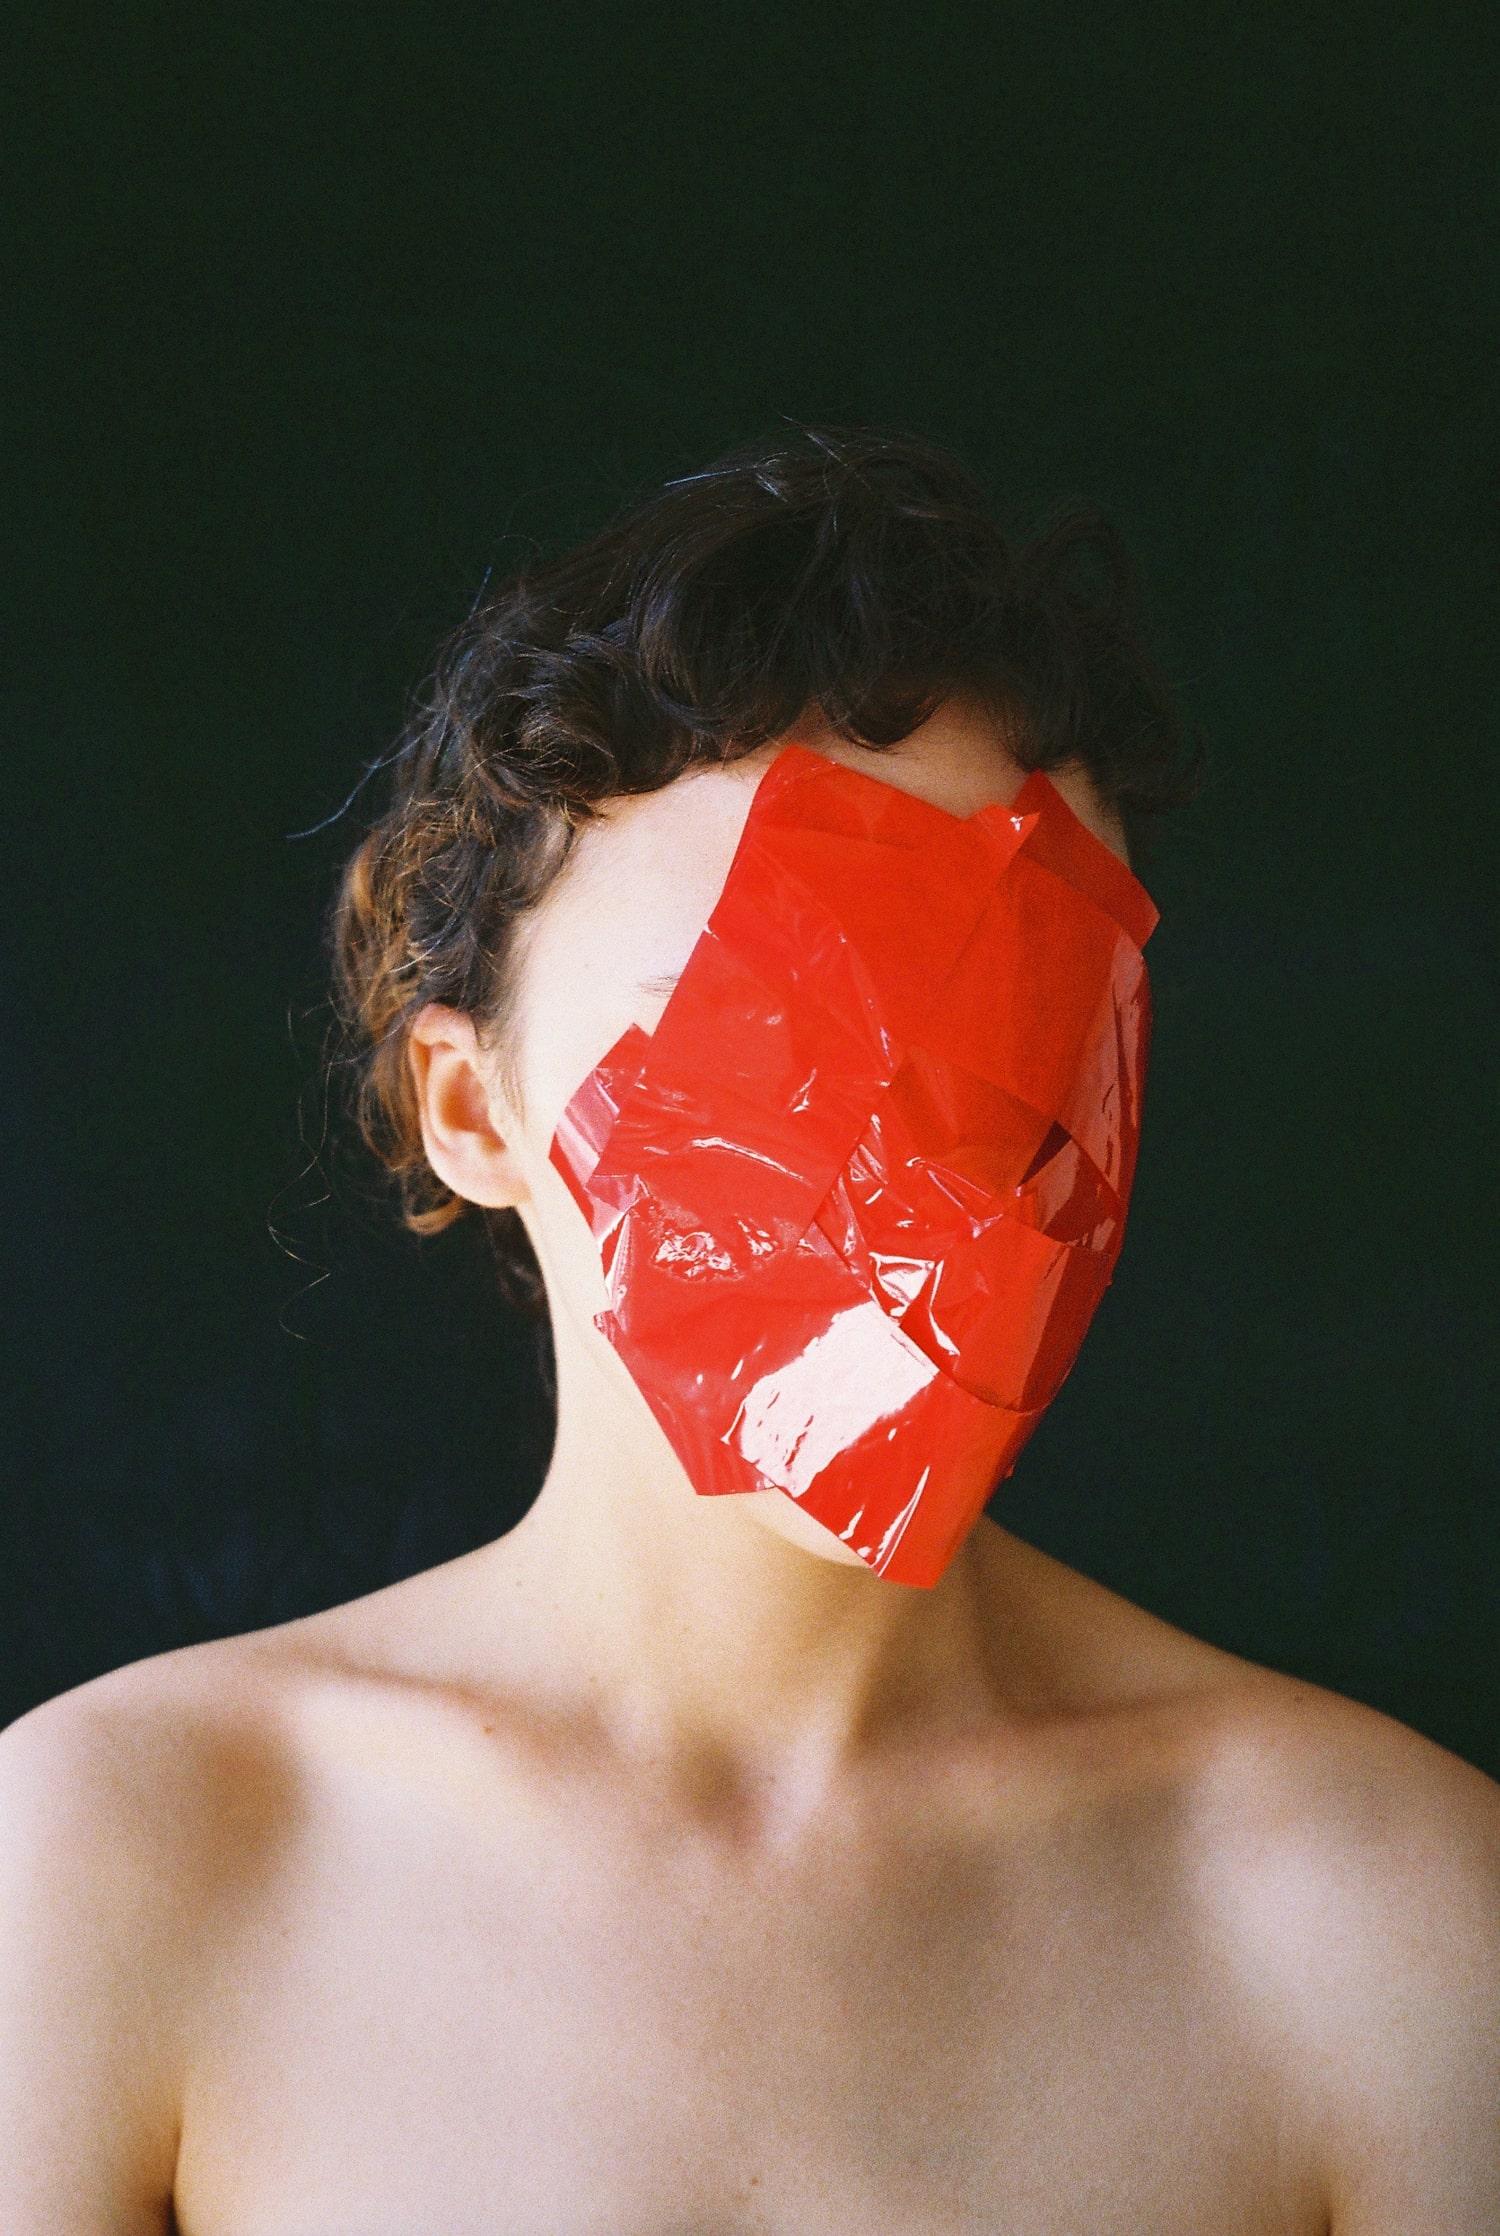 taja-spasskova-artproject-artist-photography-contemporary-blr